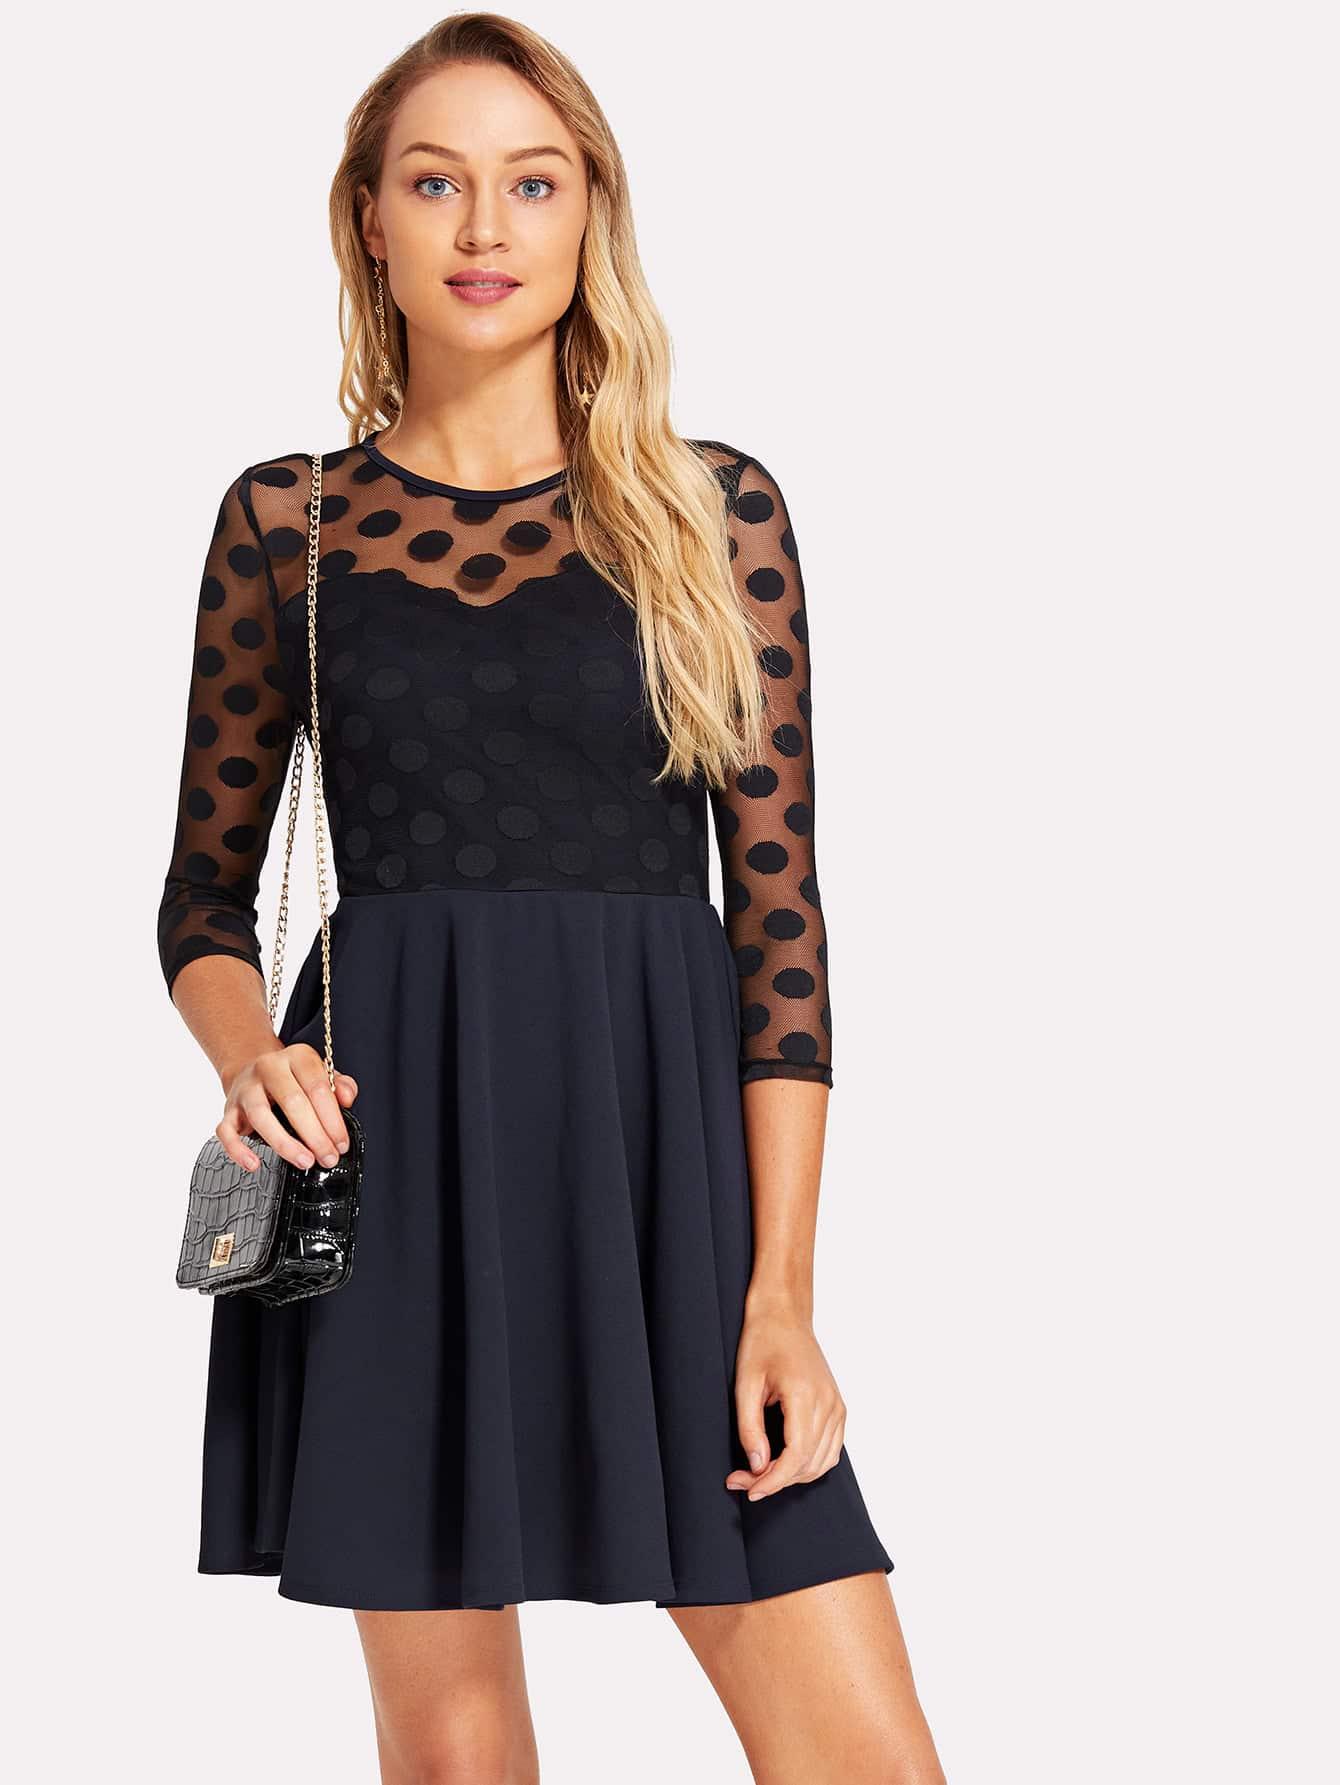 Circle Applique Mesh Fit & Flare Dress applique mesh overlay fit